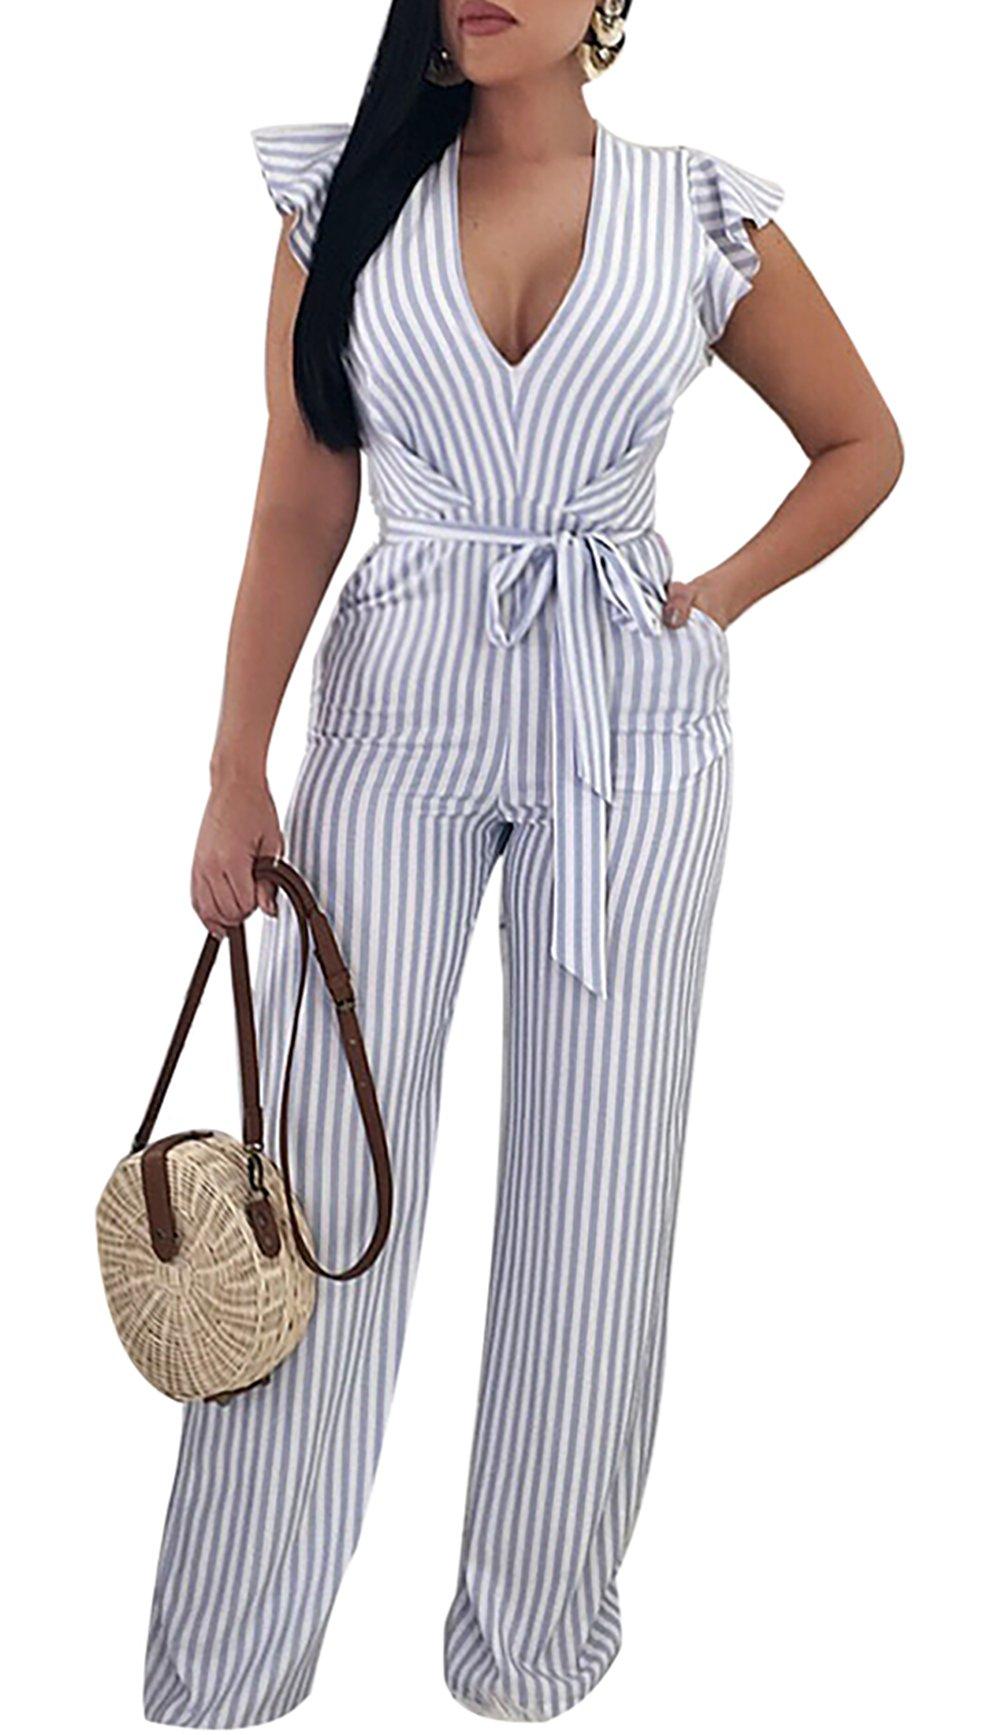 Voghtic Women Sexy Deep V Neck Ruffle Sleeve Stripe Jumpsuit High Waist Long Pants Jumpsuits Romer with Belt